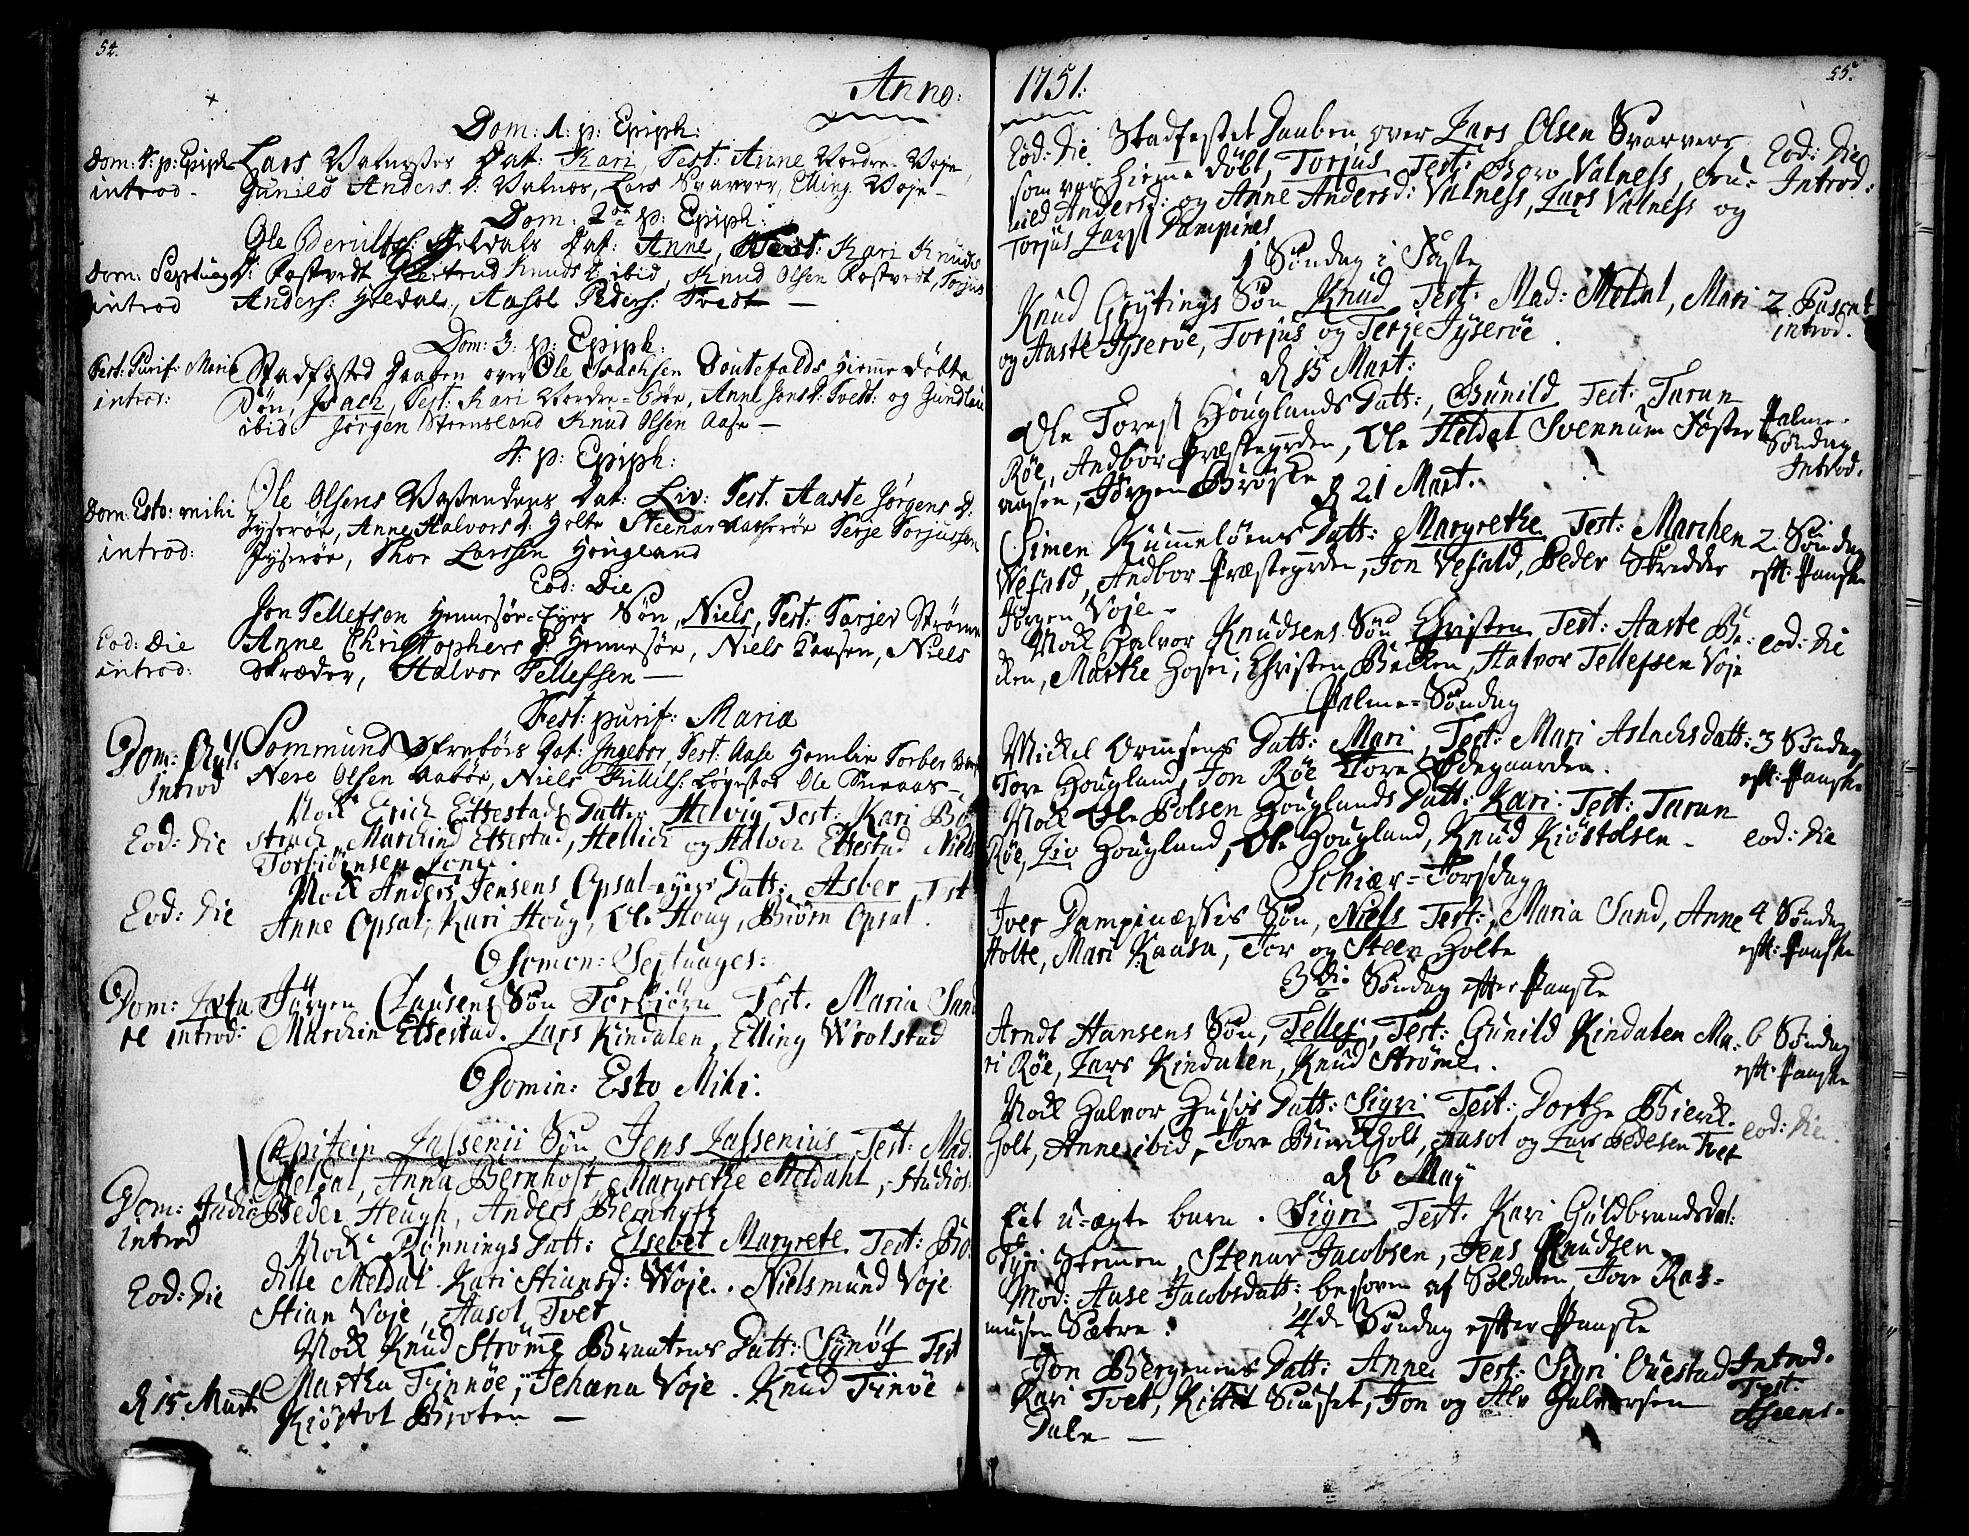 SAKO, Drangedal kirkebøker, F/Fa/L0001: Ministerialbok nr. 1, 1697-1767, s. 54-55